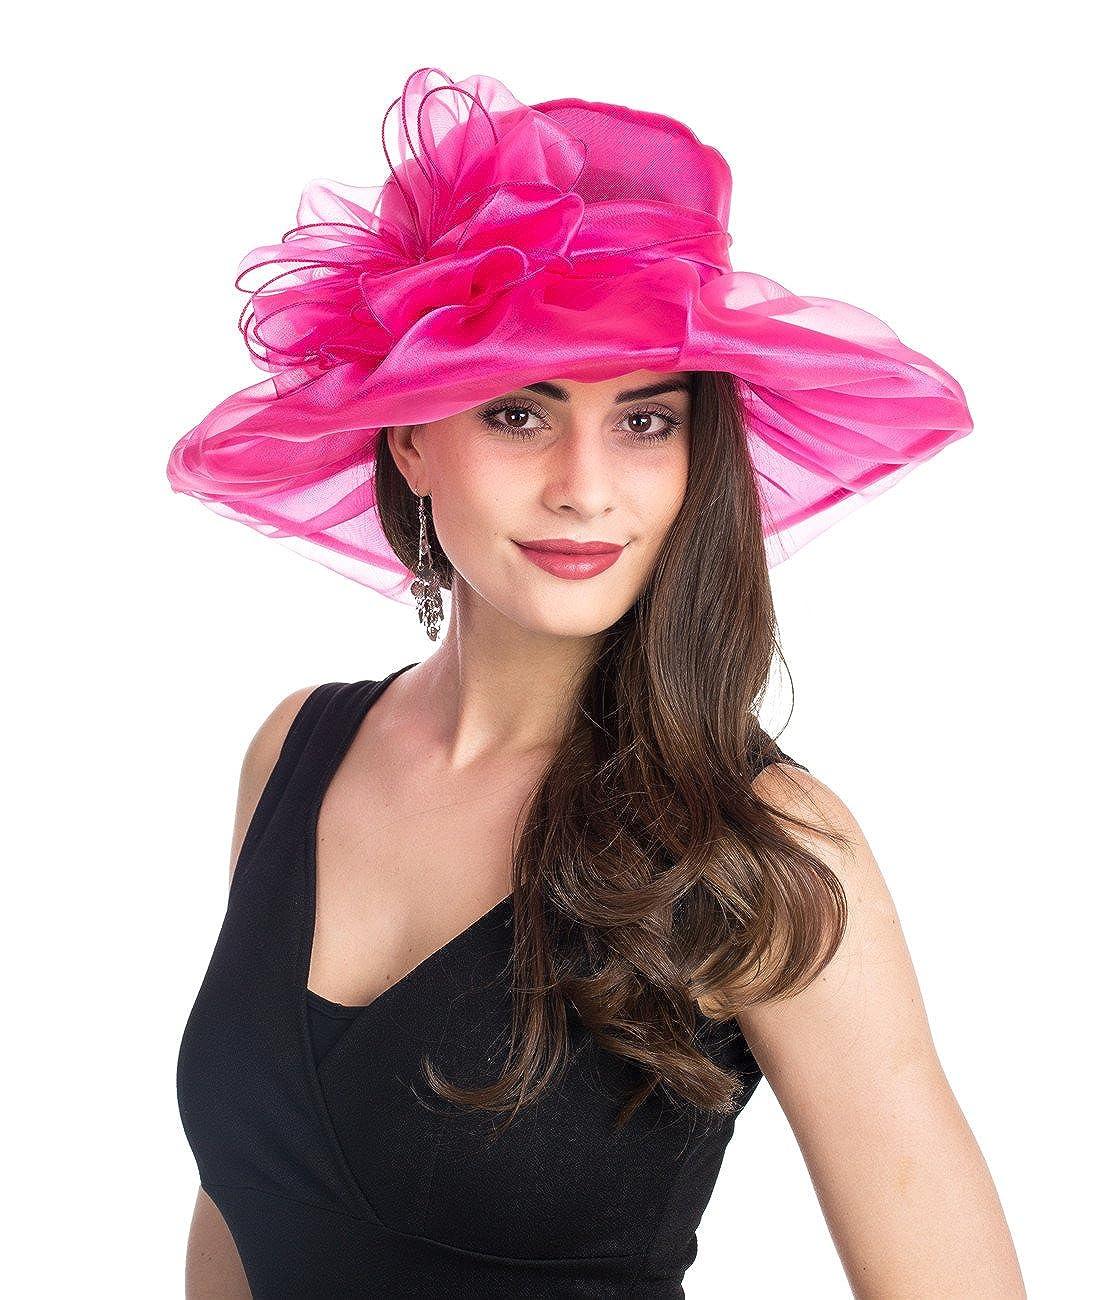 1pink Red Lucky Leaf Women Kentucky Derby Church Cap Wide Brim Summer Sun Hat for Party Wedding